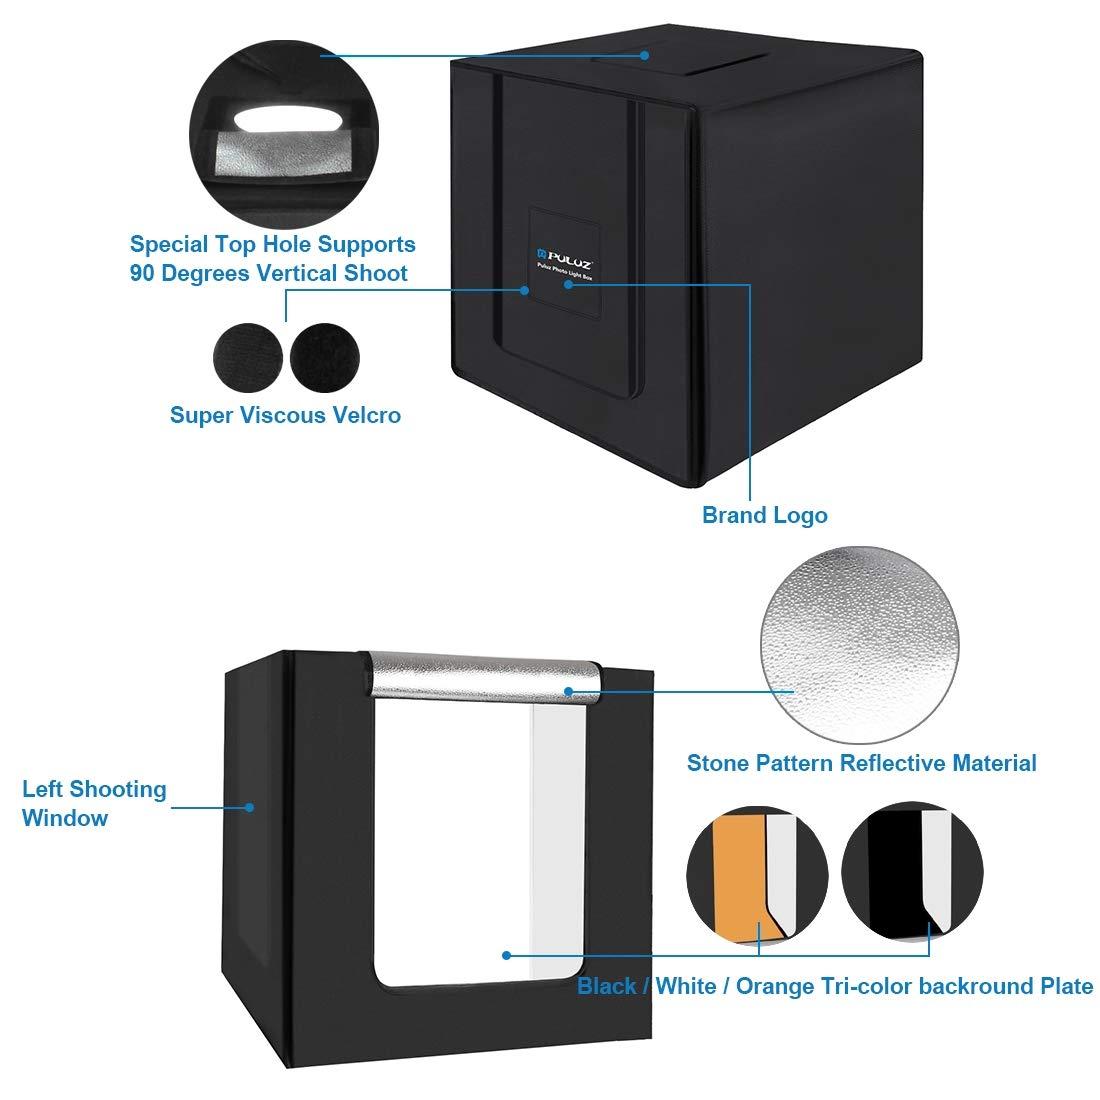 Hyx 80cm Folding Portable 80W 8500LM White Light Photo Lighting Studio Shooting Tent Box Kit with 3 Colors Backdrops Camera Parts Accessories Black, White, Orange